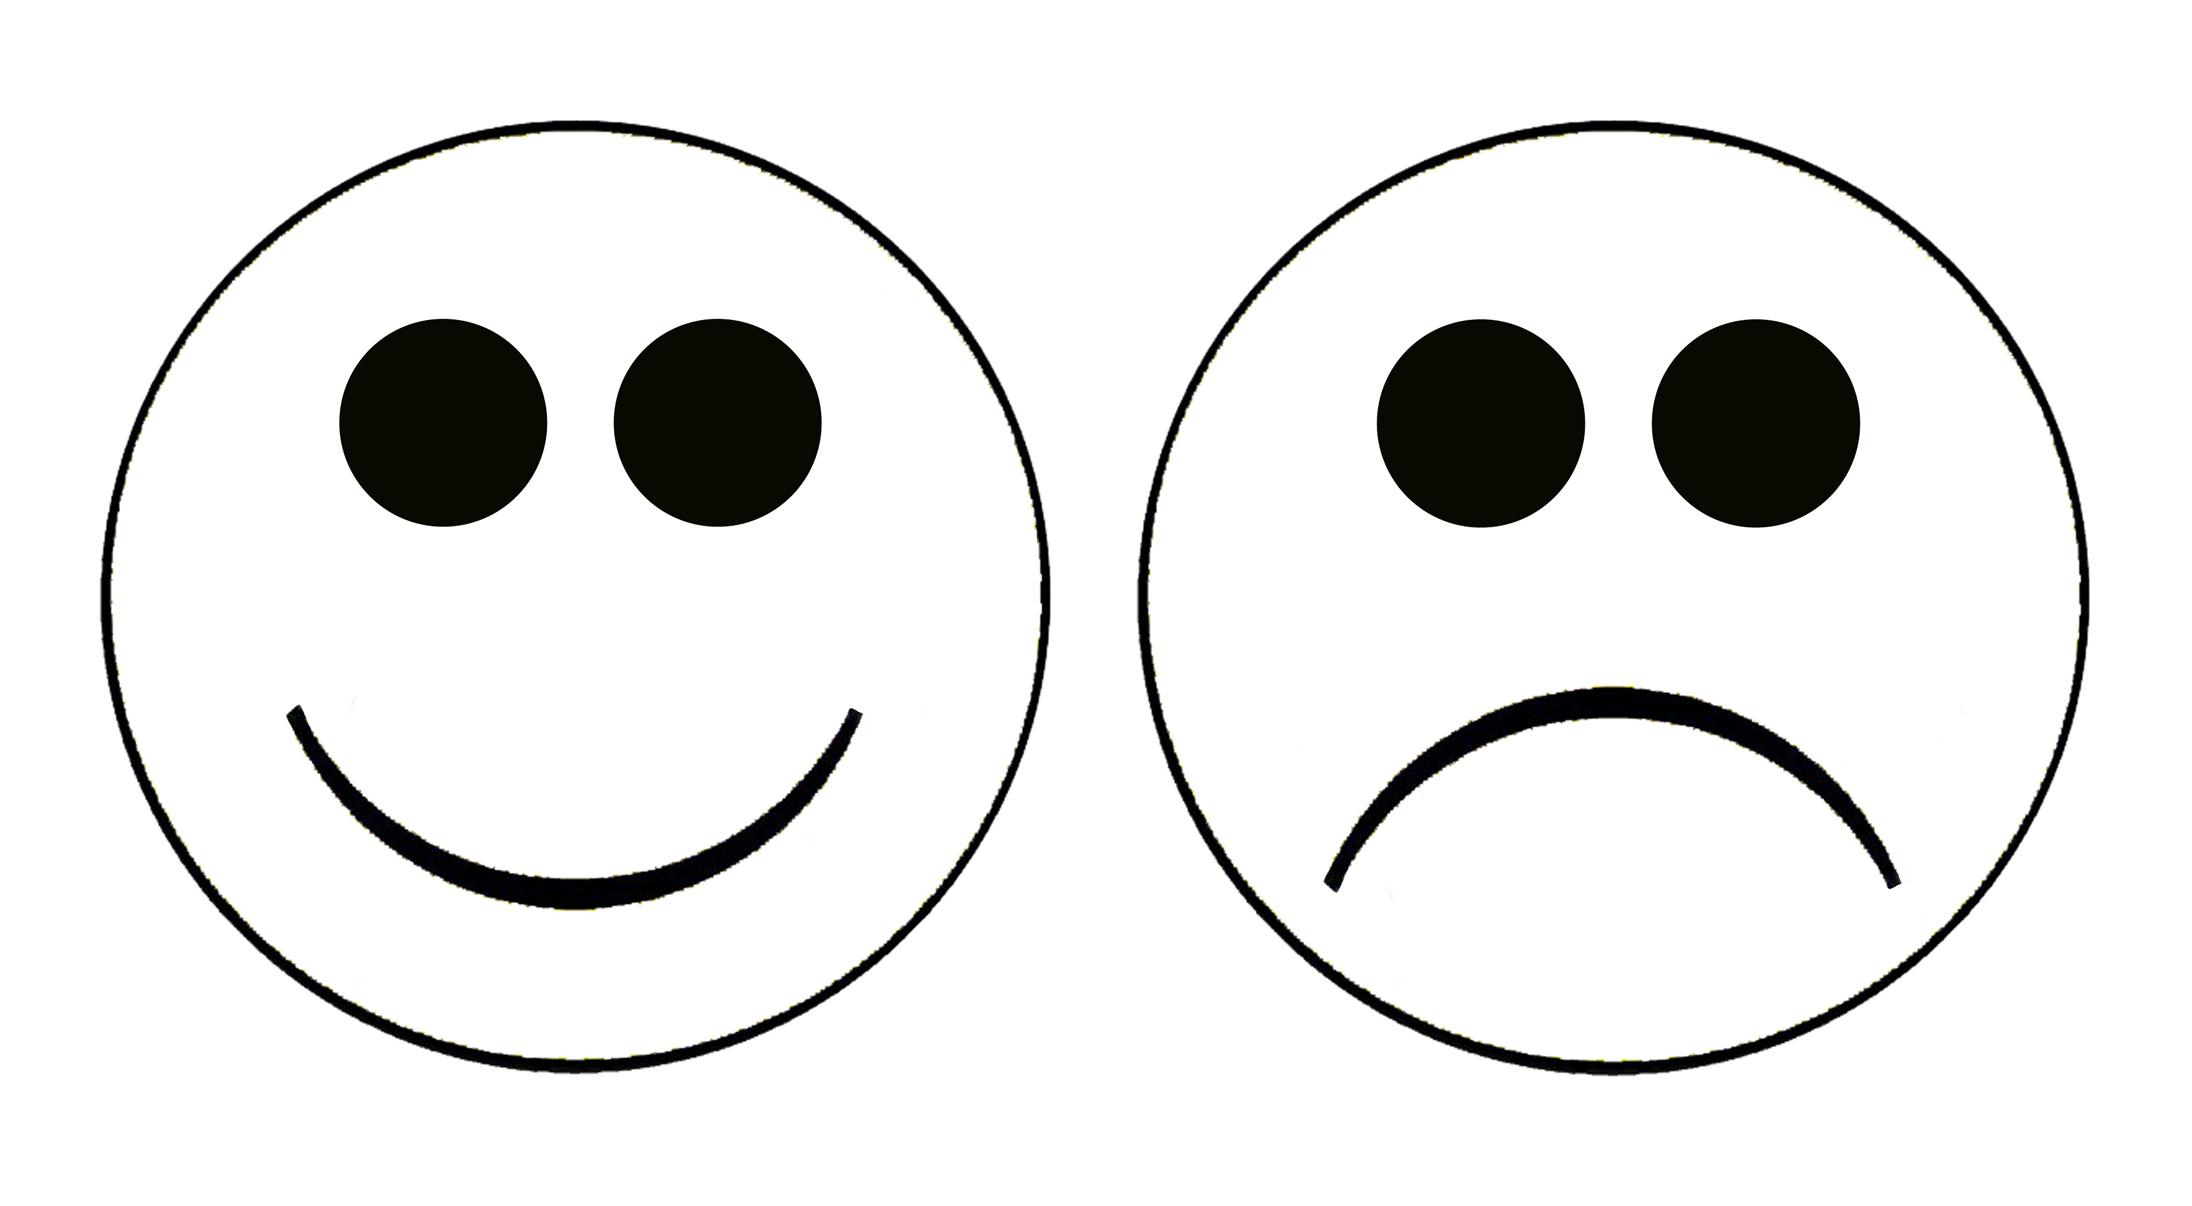 2192x1206 Drawn Smileys Frowny